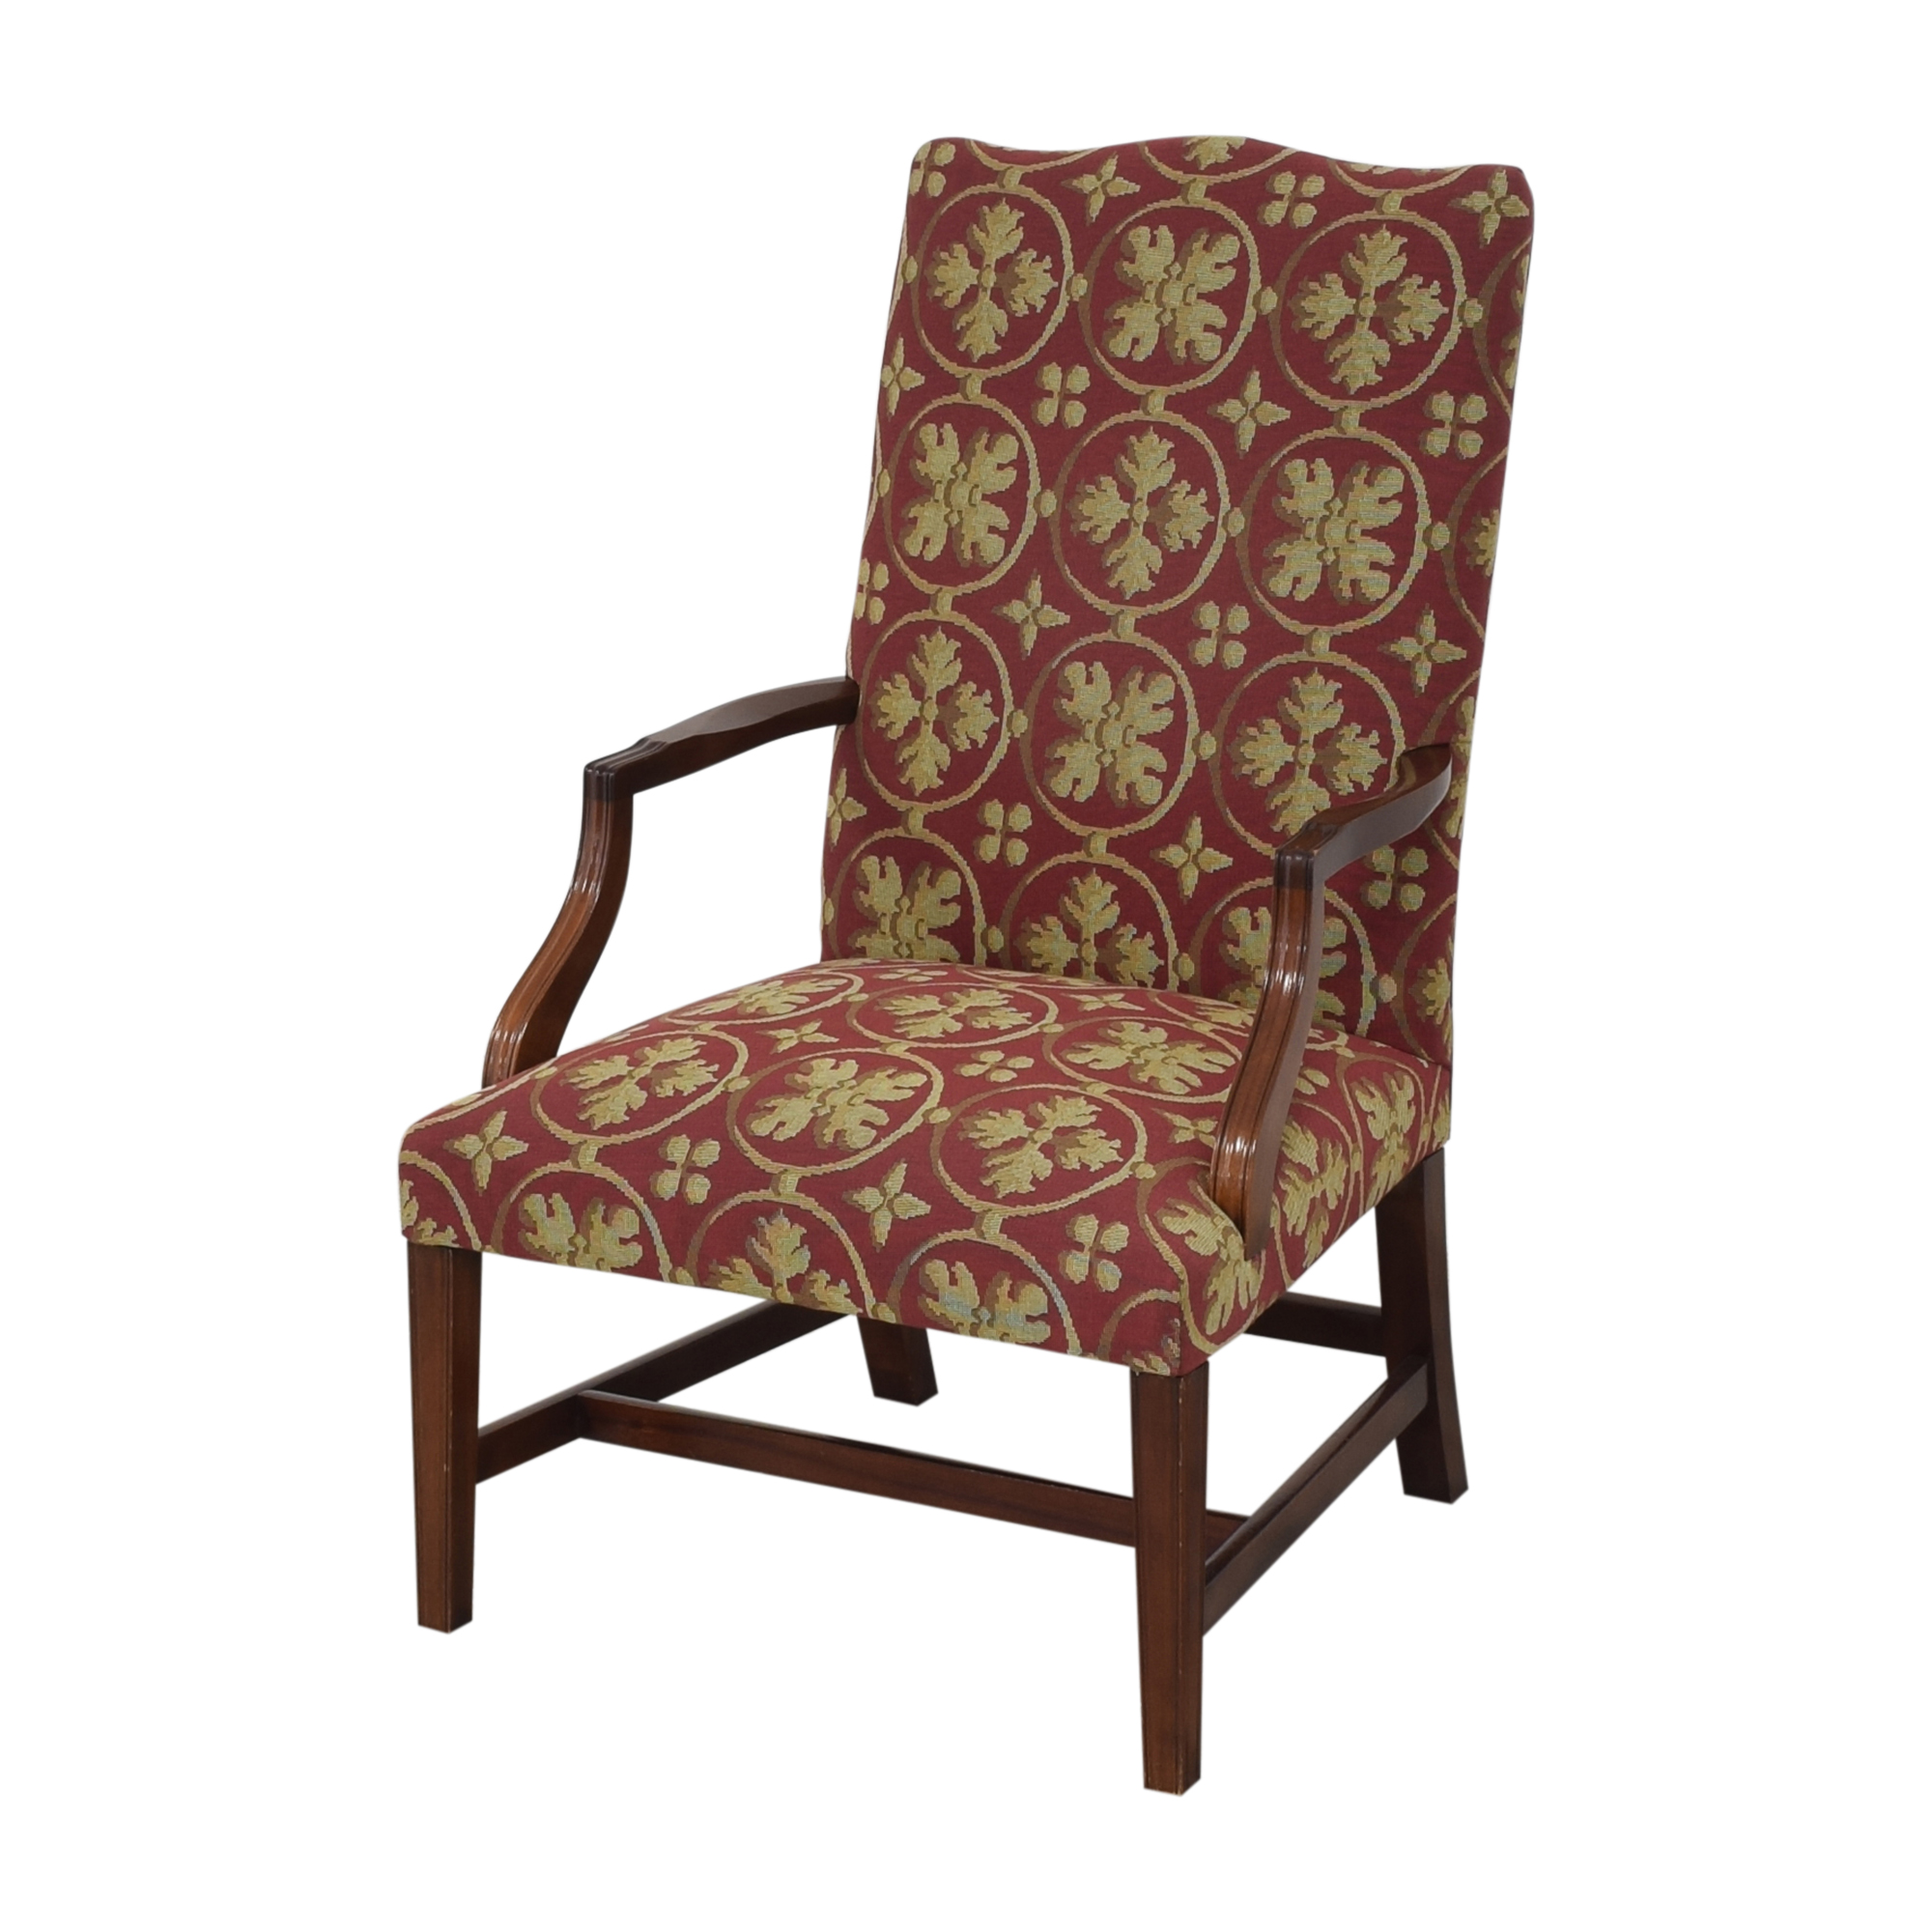 Custom Camelback Armchair / Accent Chairs